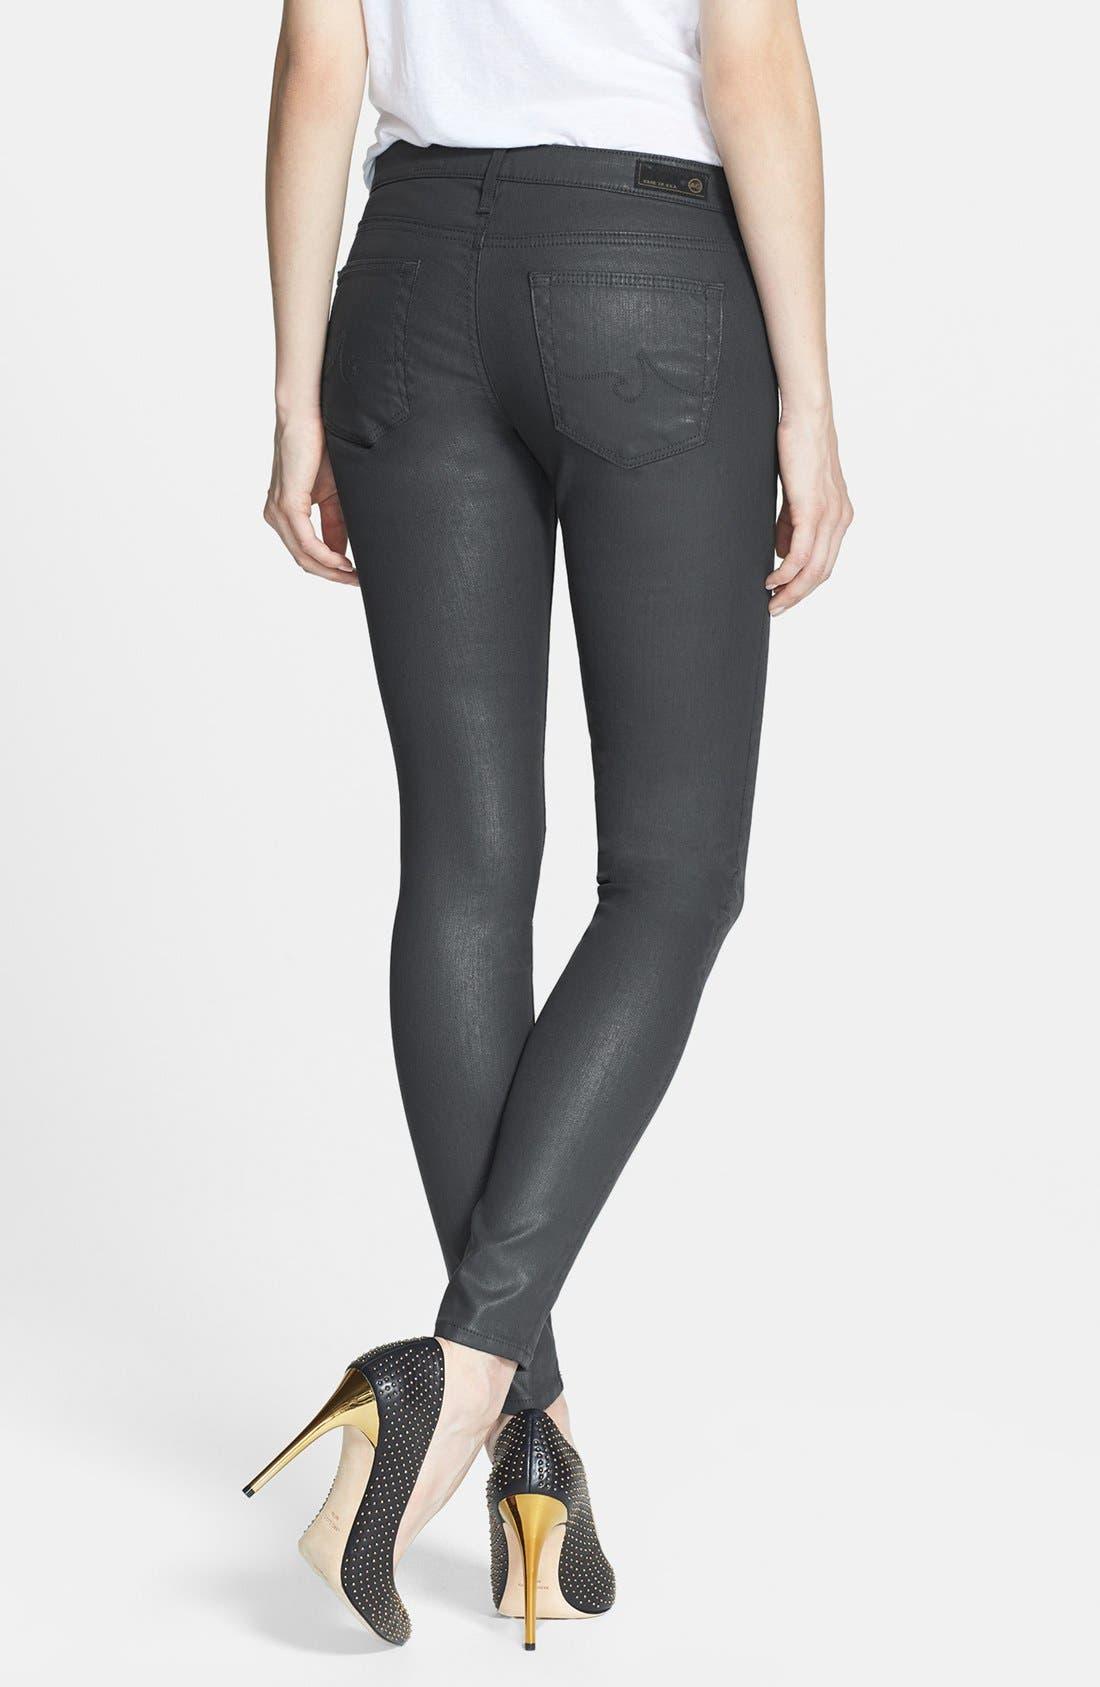 Alternate Image 2  - AG 'The Absolute Legging' Coated Skinny Jeans (Dark Grey)